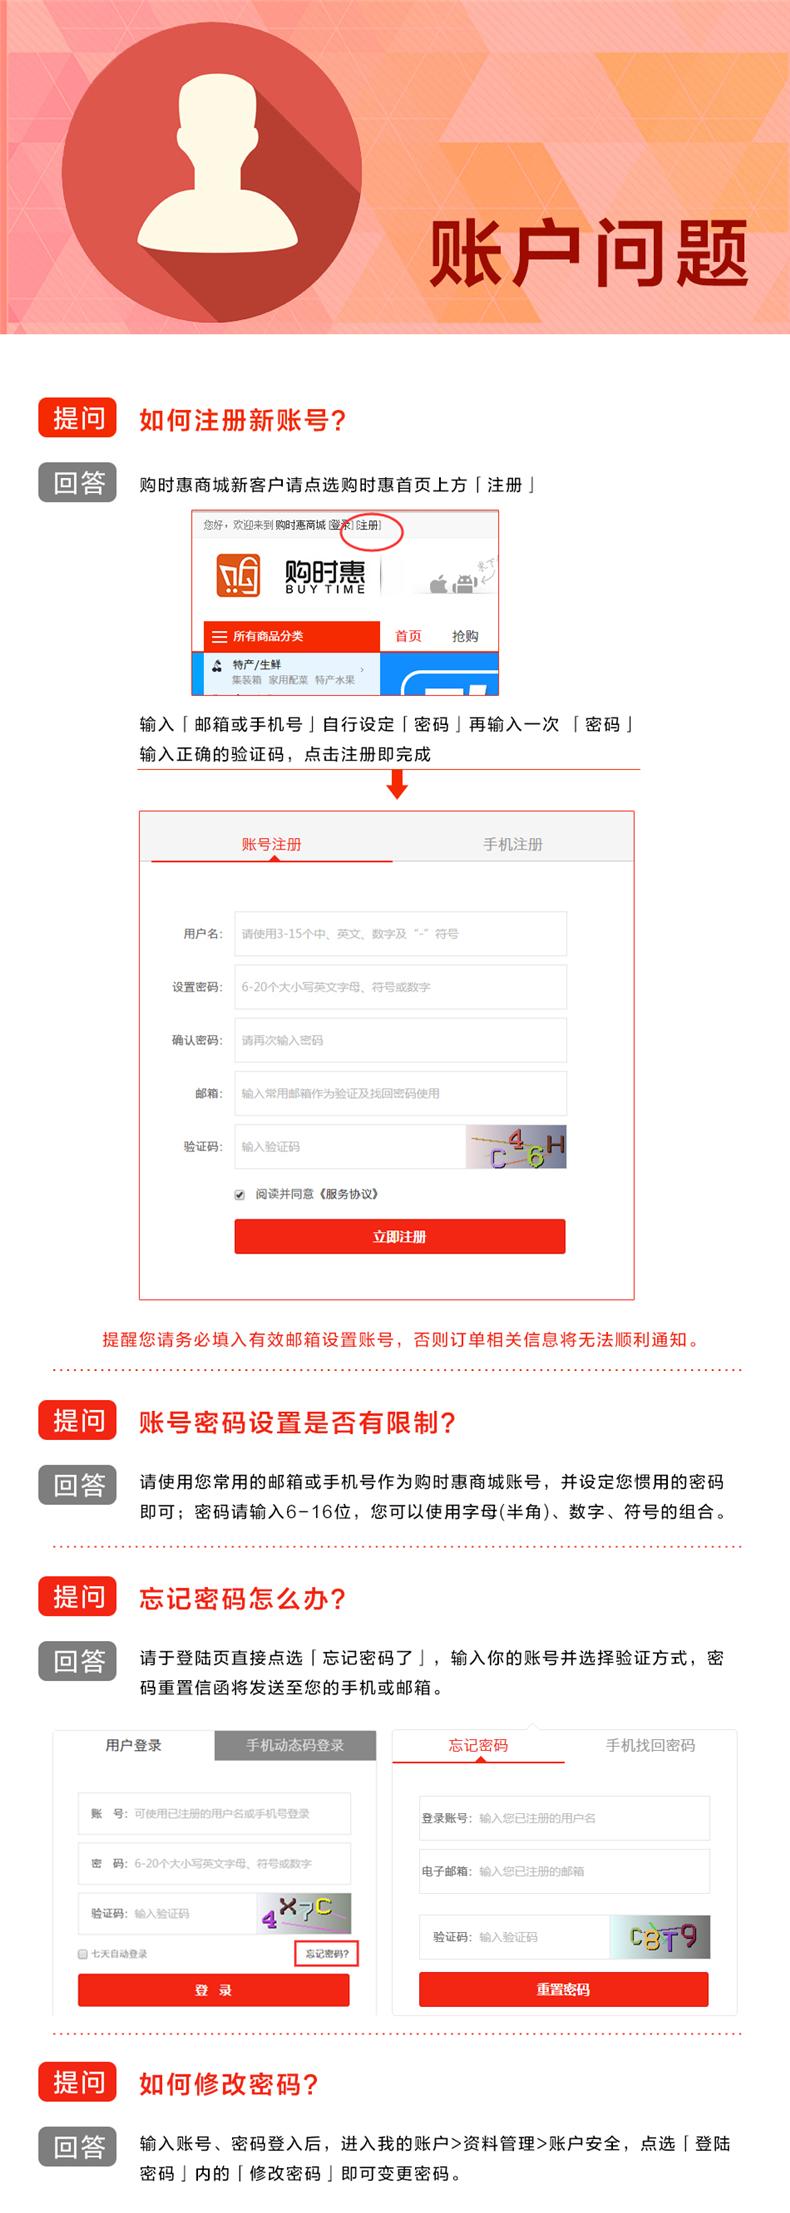 http://www.goushihui168.com/data/upload/mall/article/05168876467515201.jpg